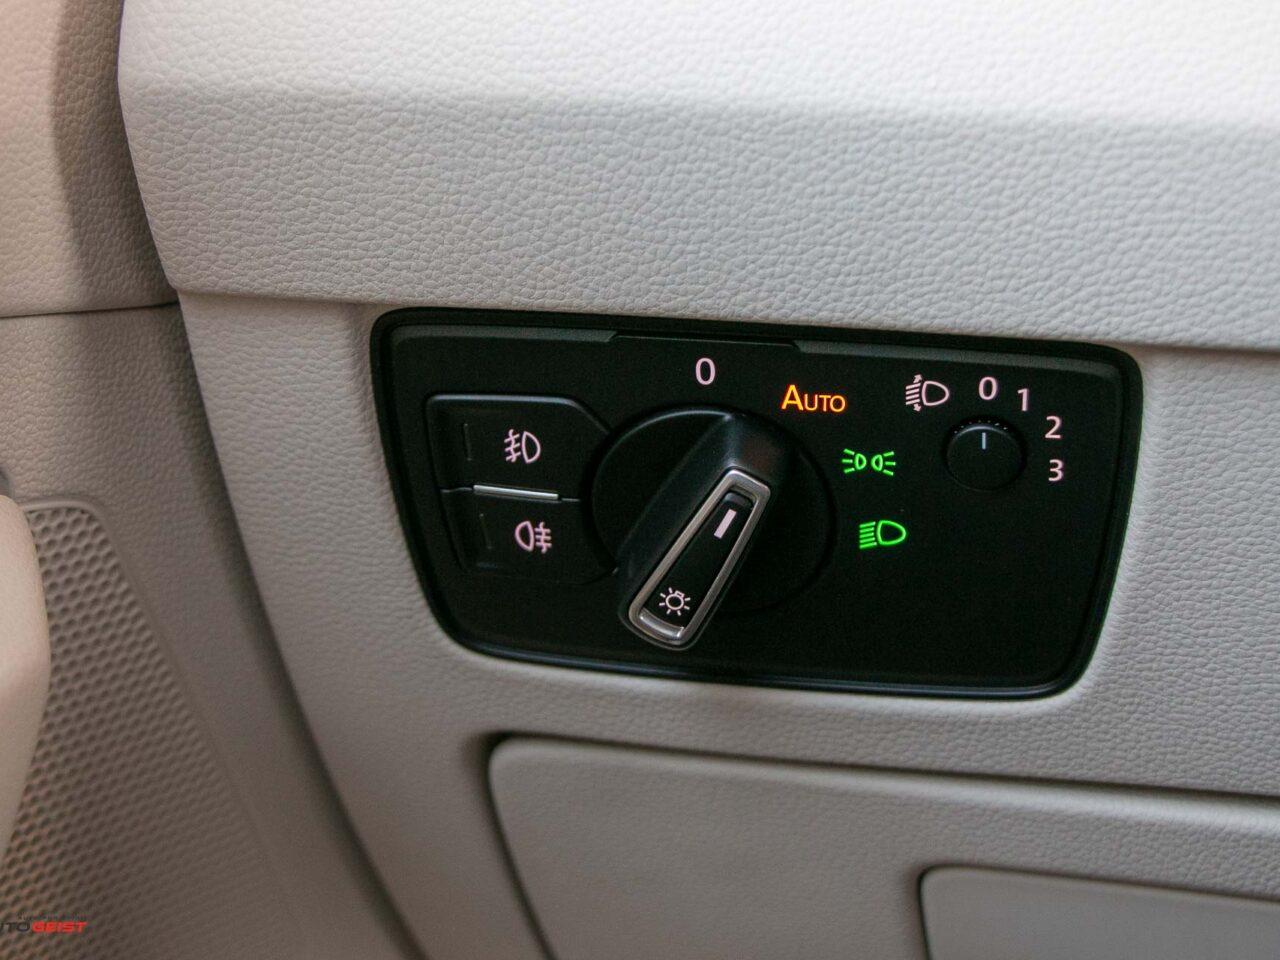 VW-PASSAT-break-panoramic-4518